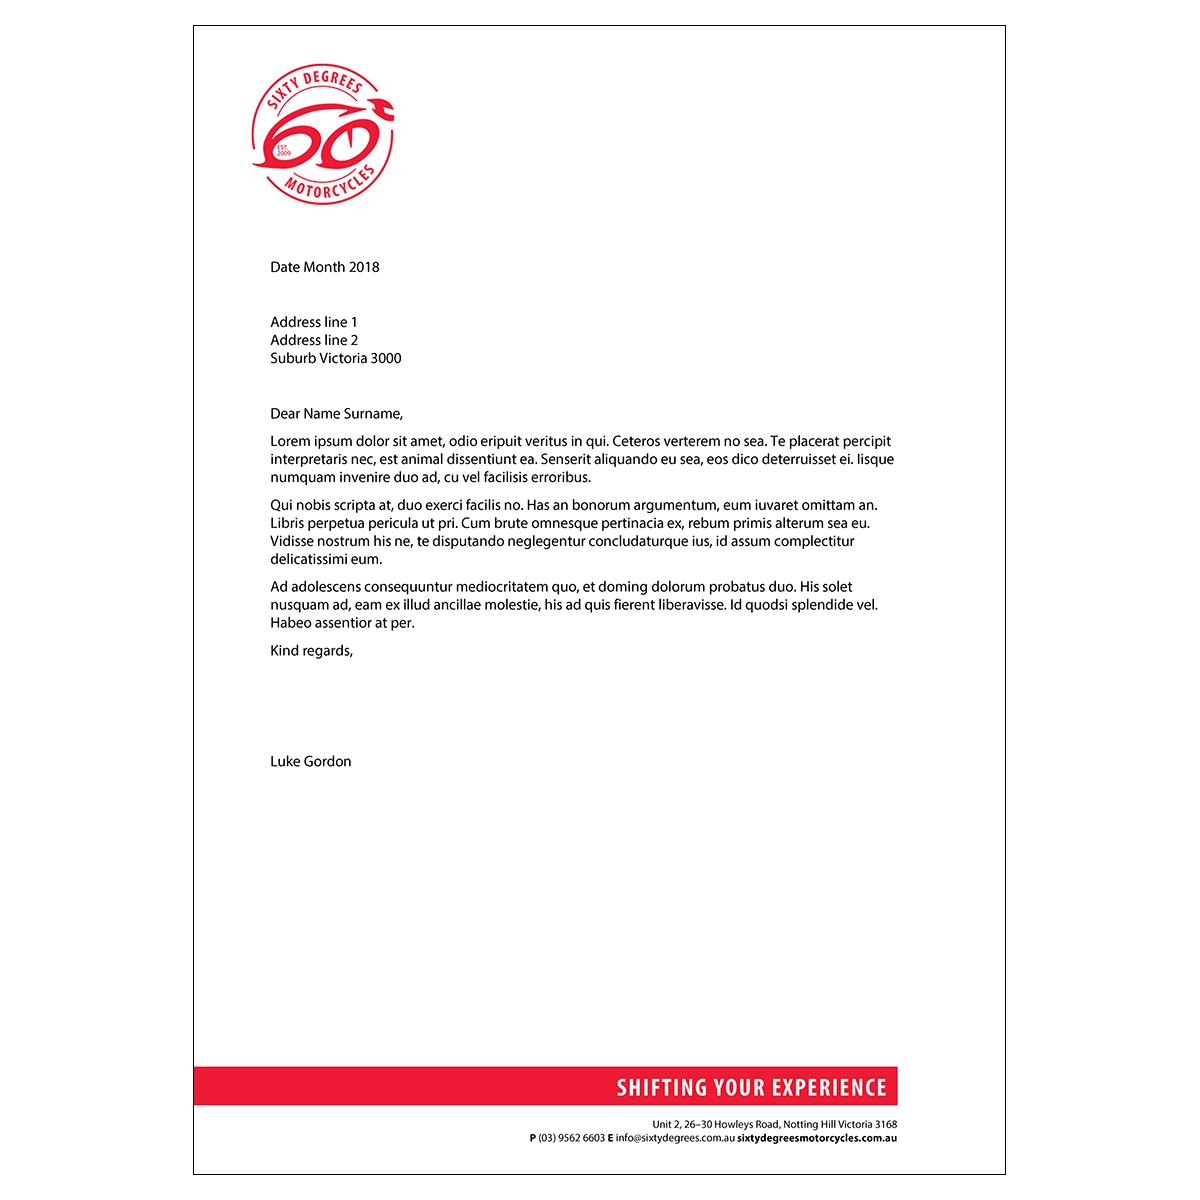 Sixty-Degrees-Motorcycles-logo-design-letterhead.jpg